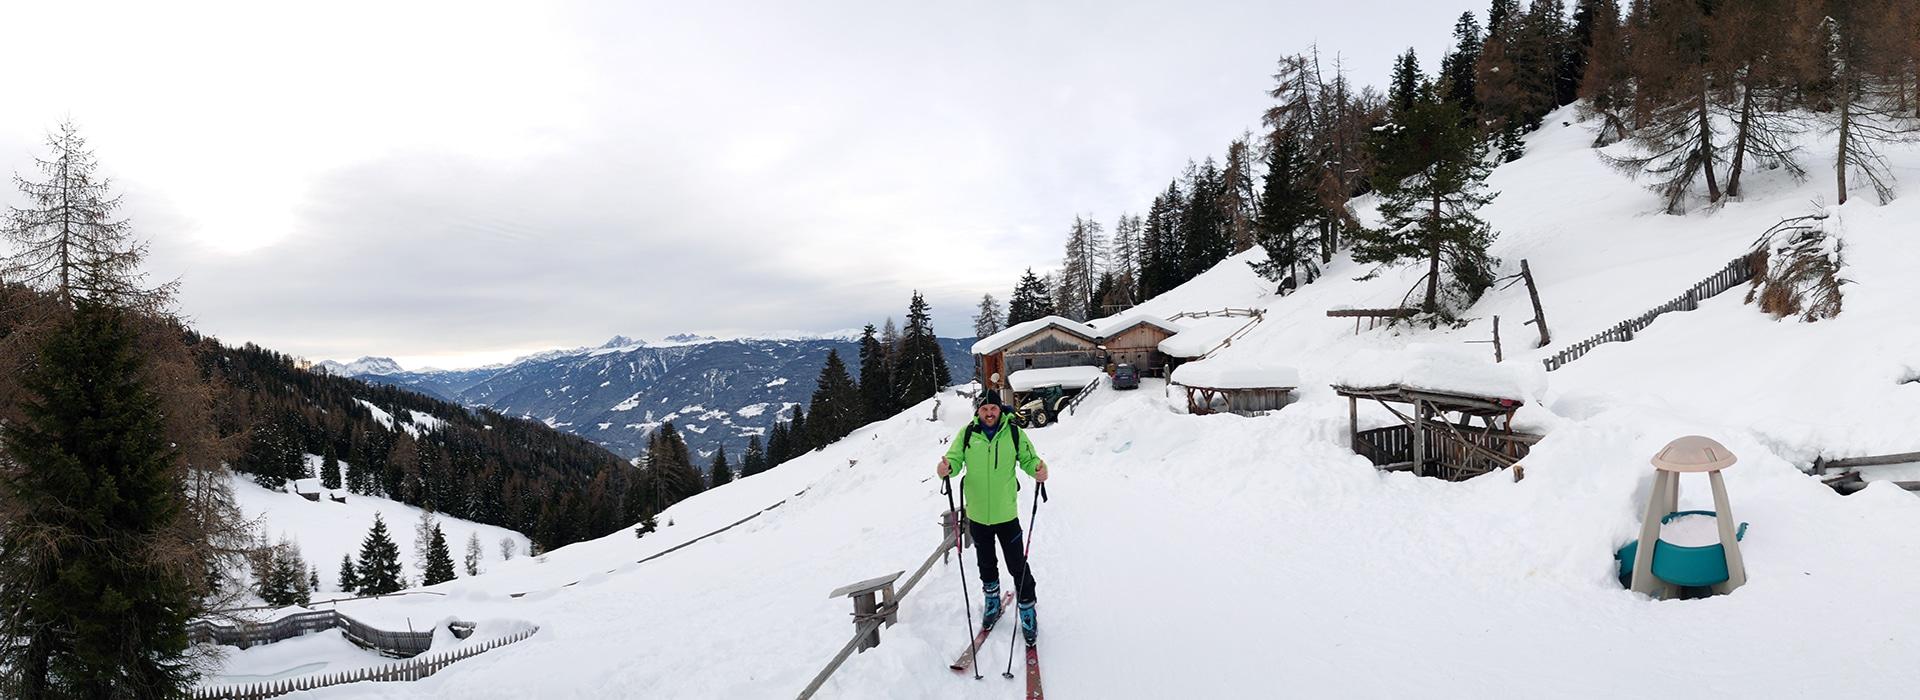 Moarhofalm - Almen in Südtirol – Meransen – I mog südtirol – Wandern in Südtirol - Winterwandern